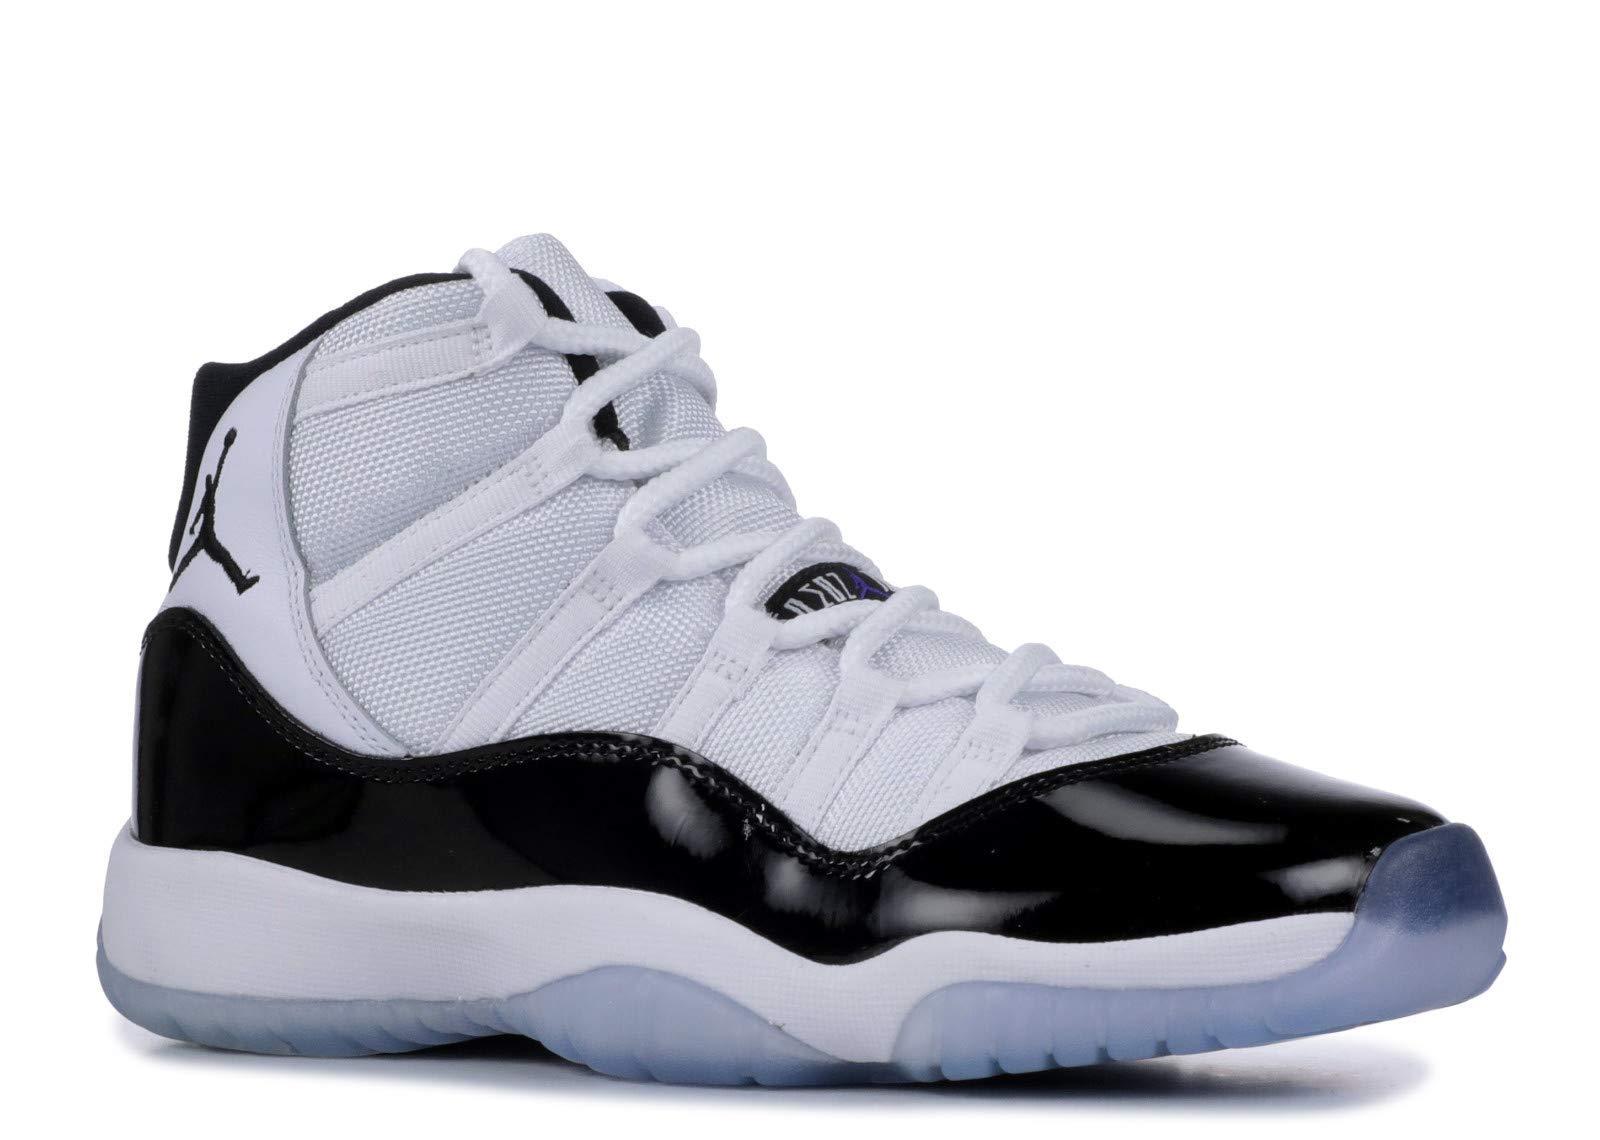 Nike Big Kids Jordan Retro 11 ''Concord'' Basketball Shoe (6.5)